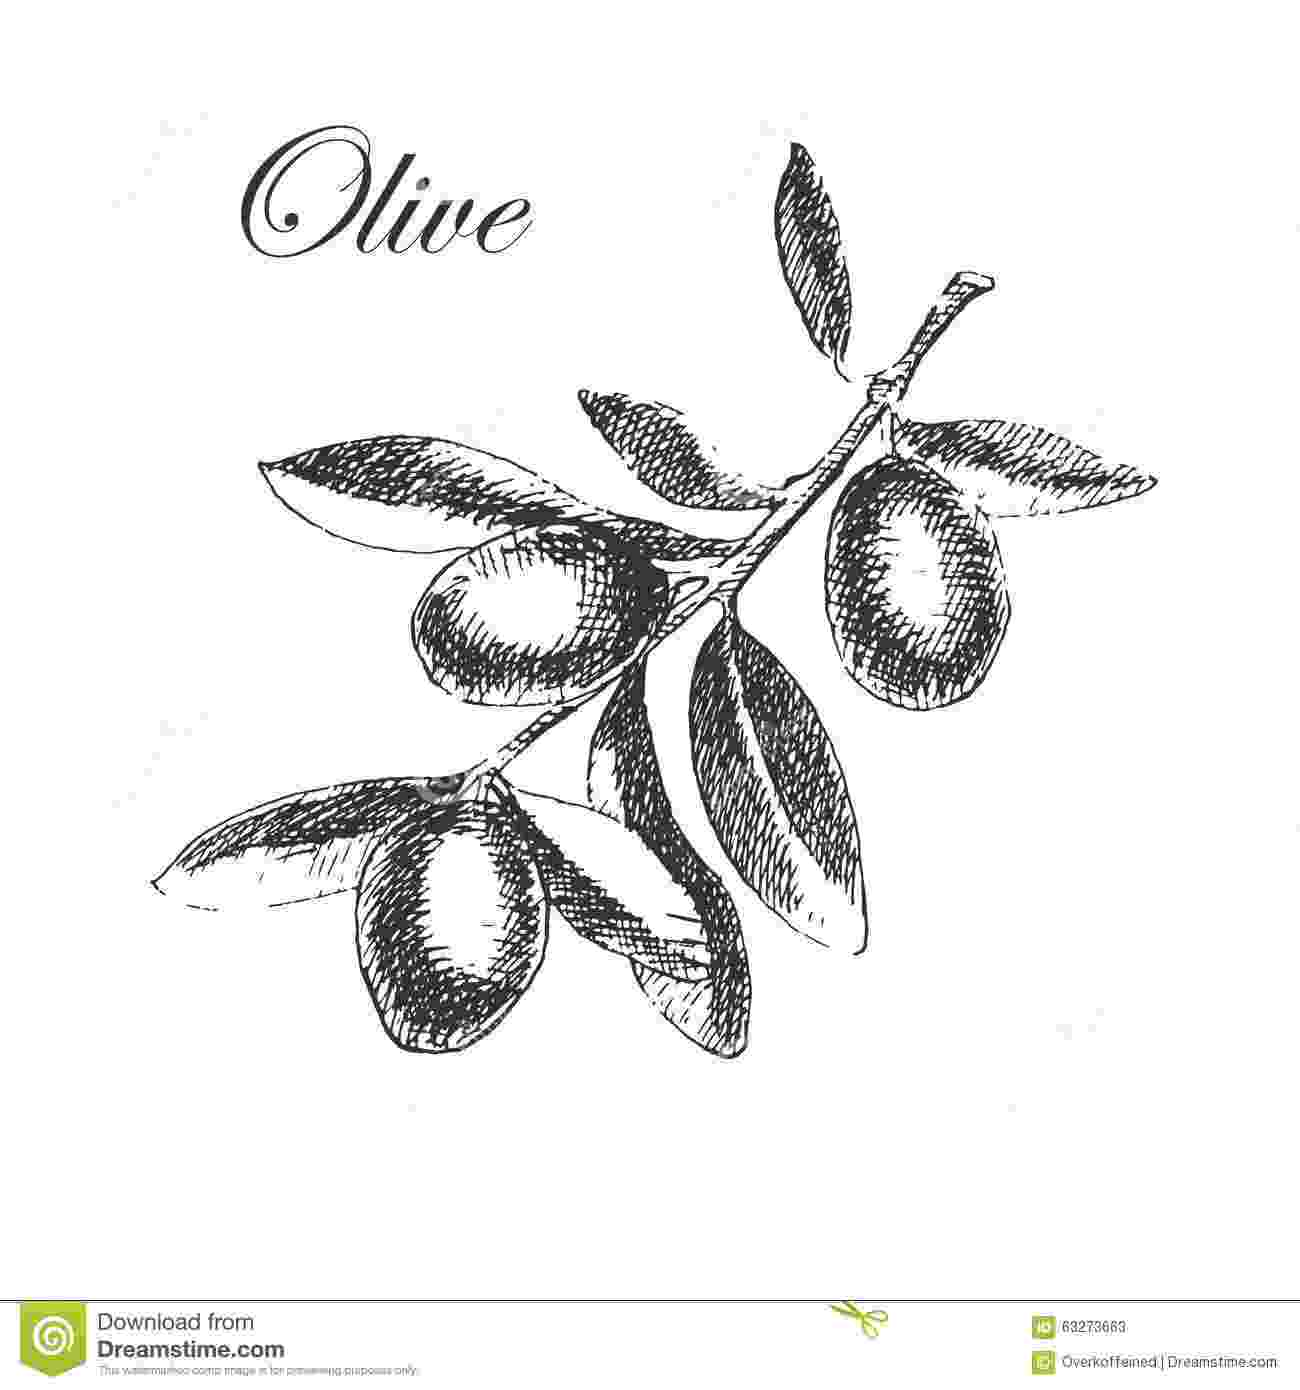 olive branch sketch vector hand drawn olive branch detailed sketch stock branch sketch olive